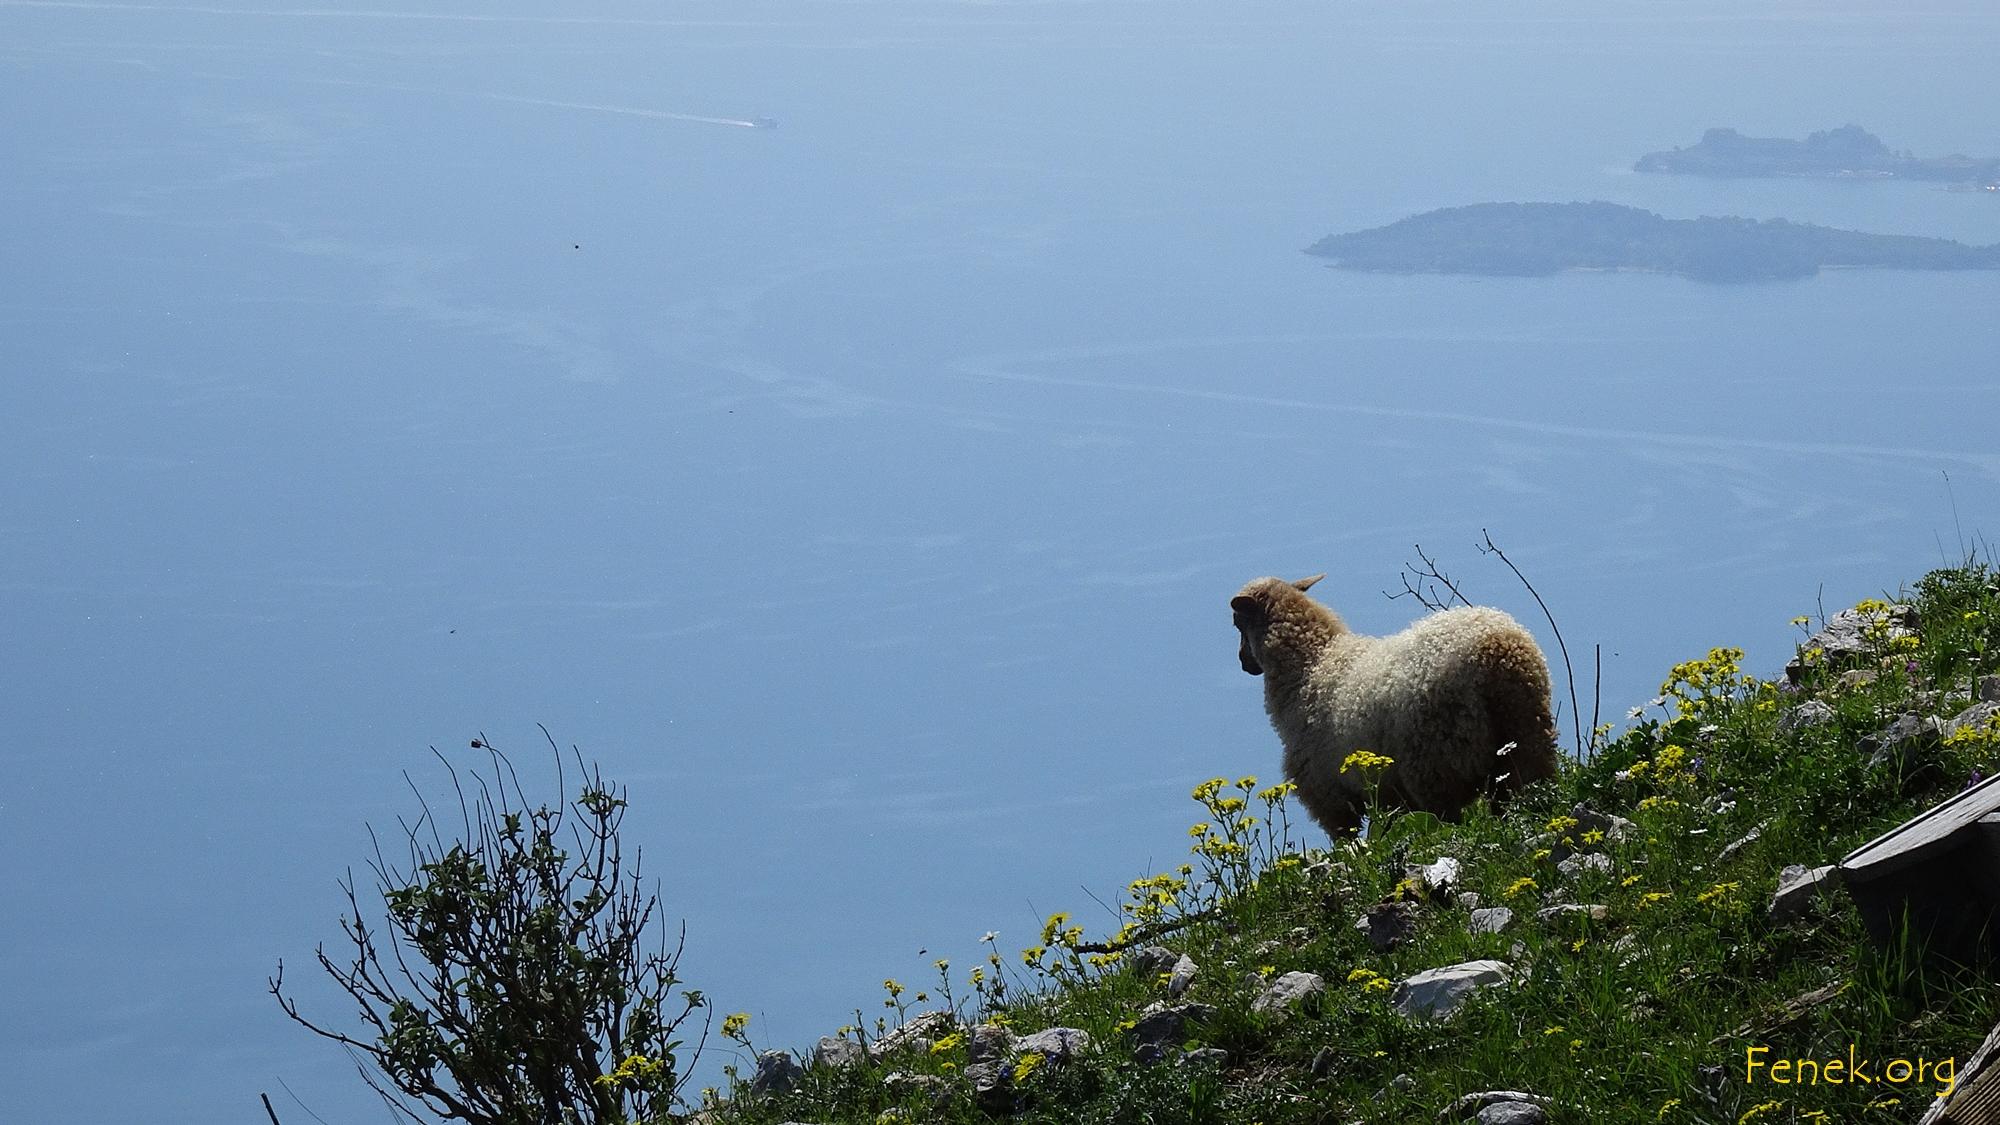 das Schaf geniesst auch den Ausblick ;-)